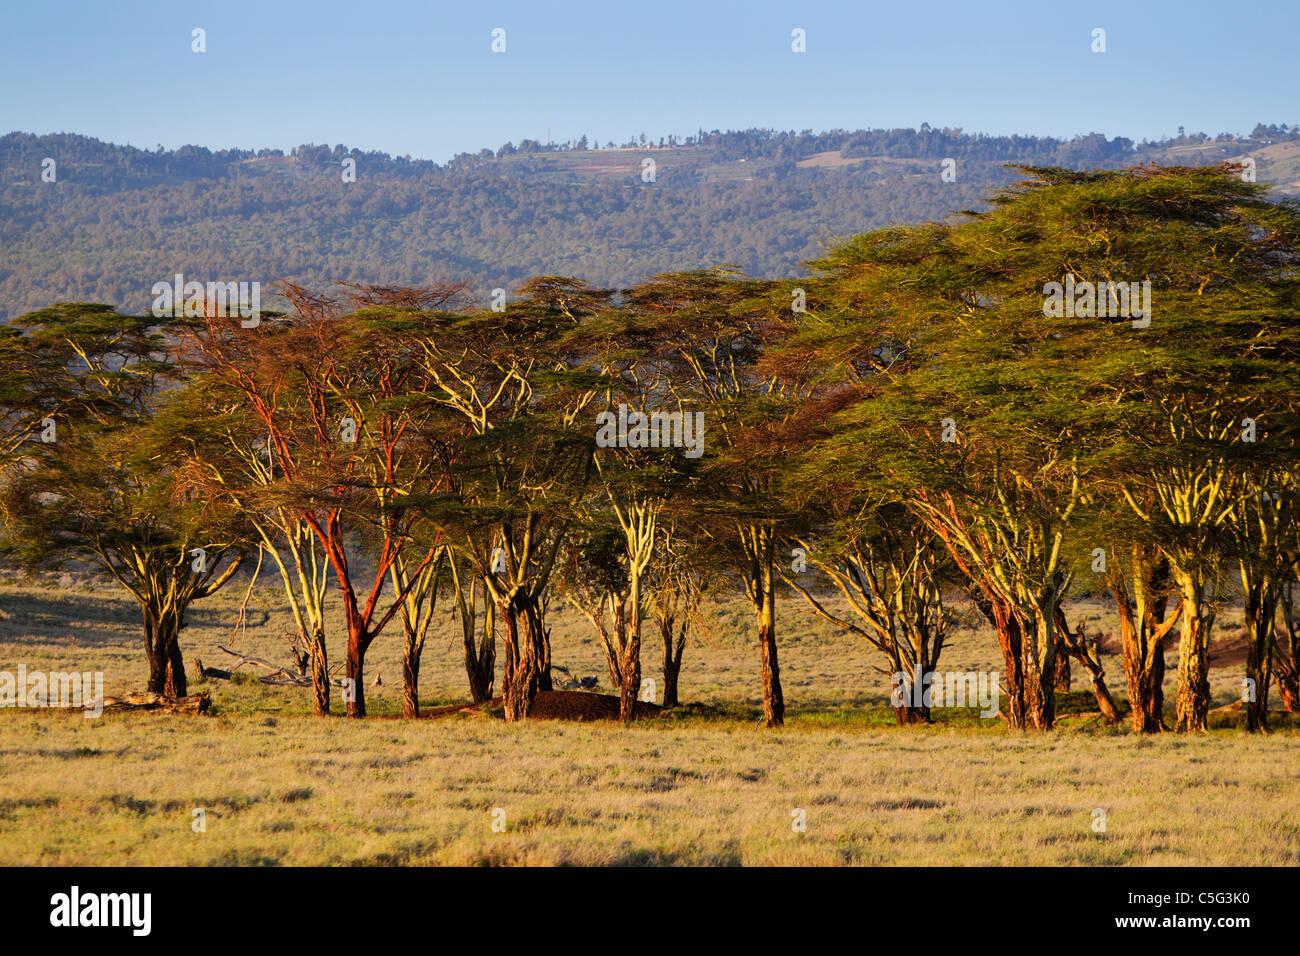 Fever tree (Acacia xanthophloea) in Kenya Immagini Stock